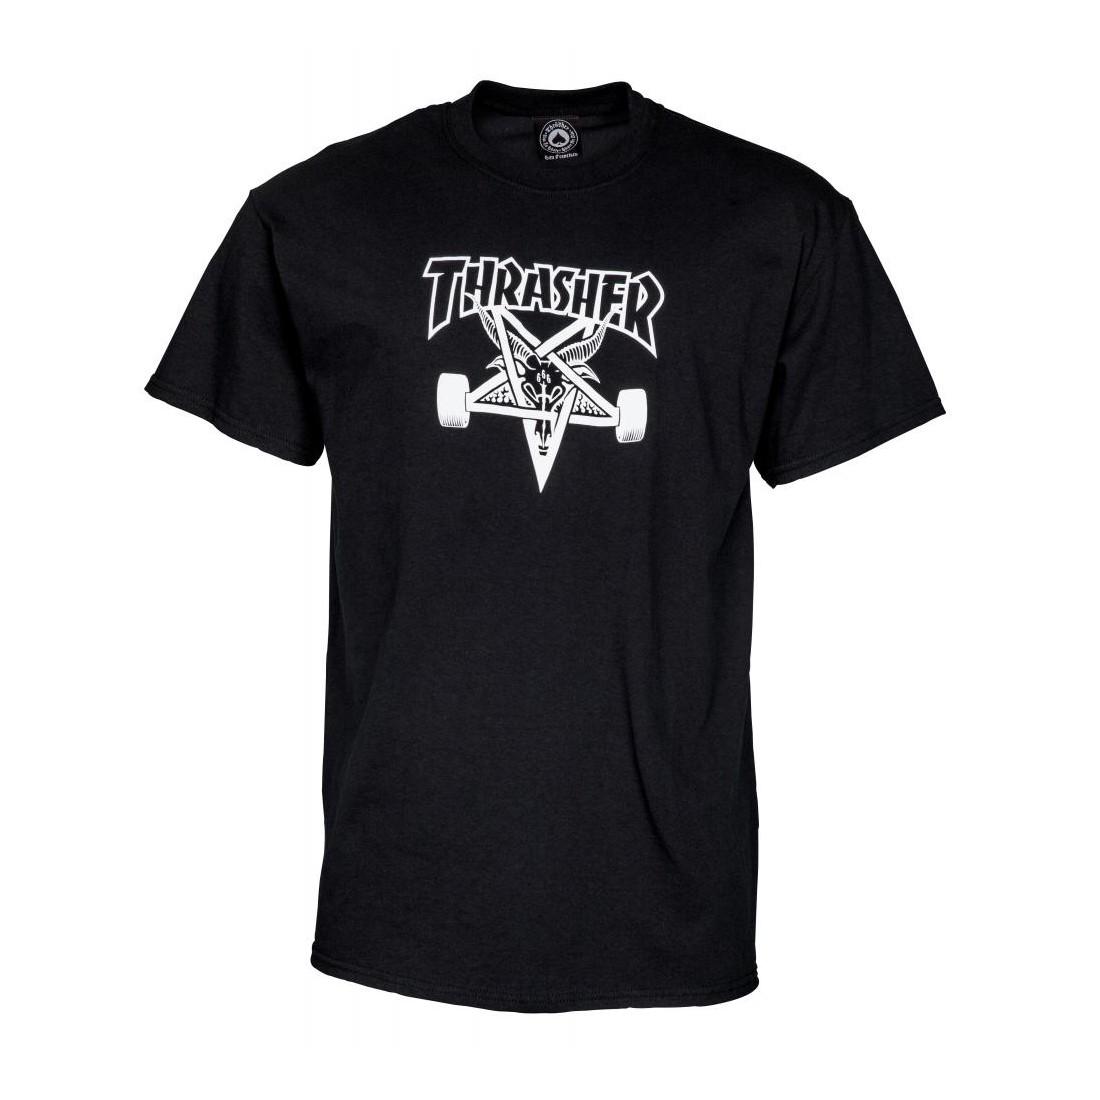 T Shirt Thrasher Skategoat black